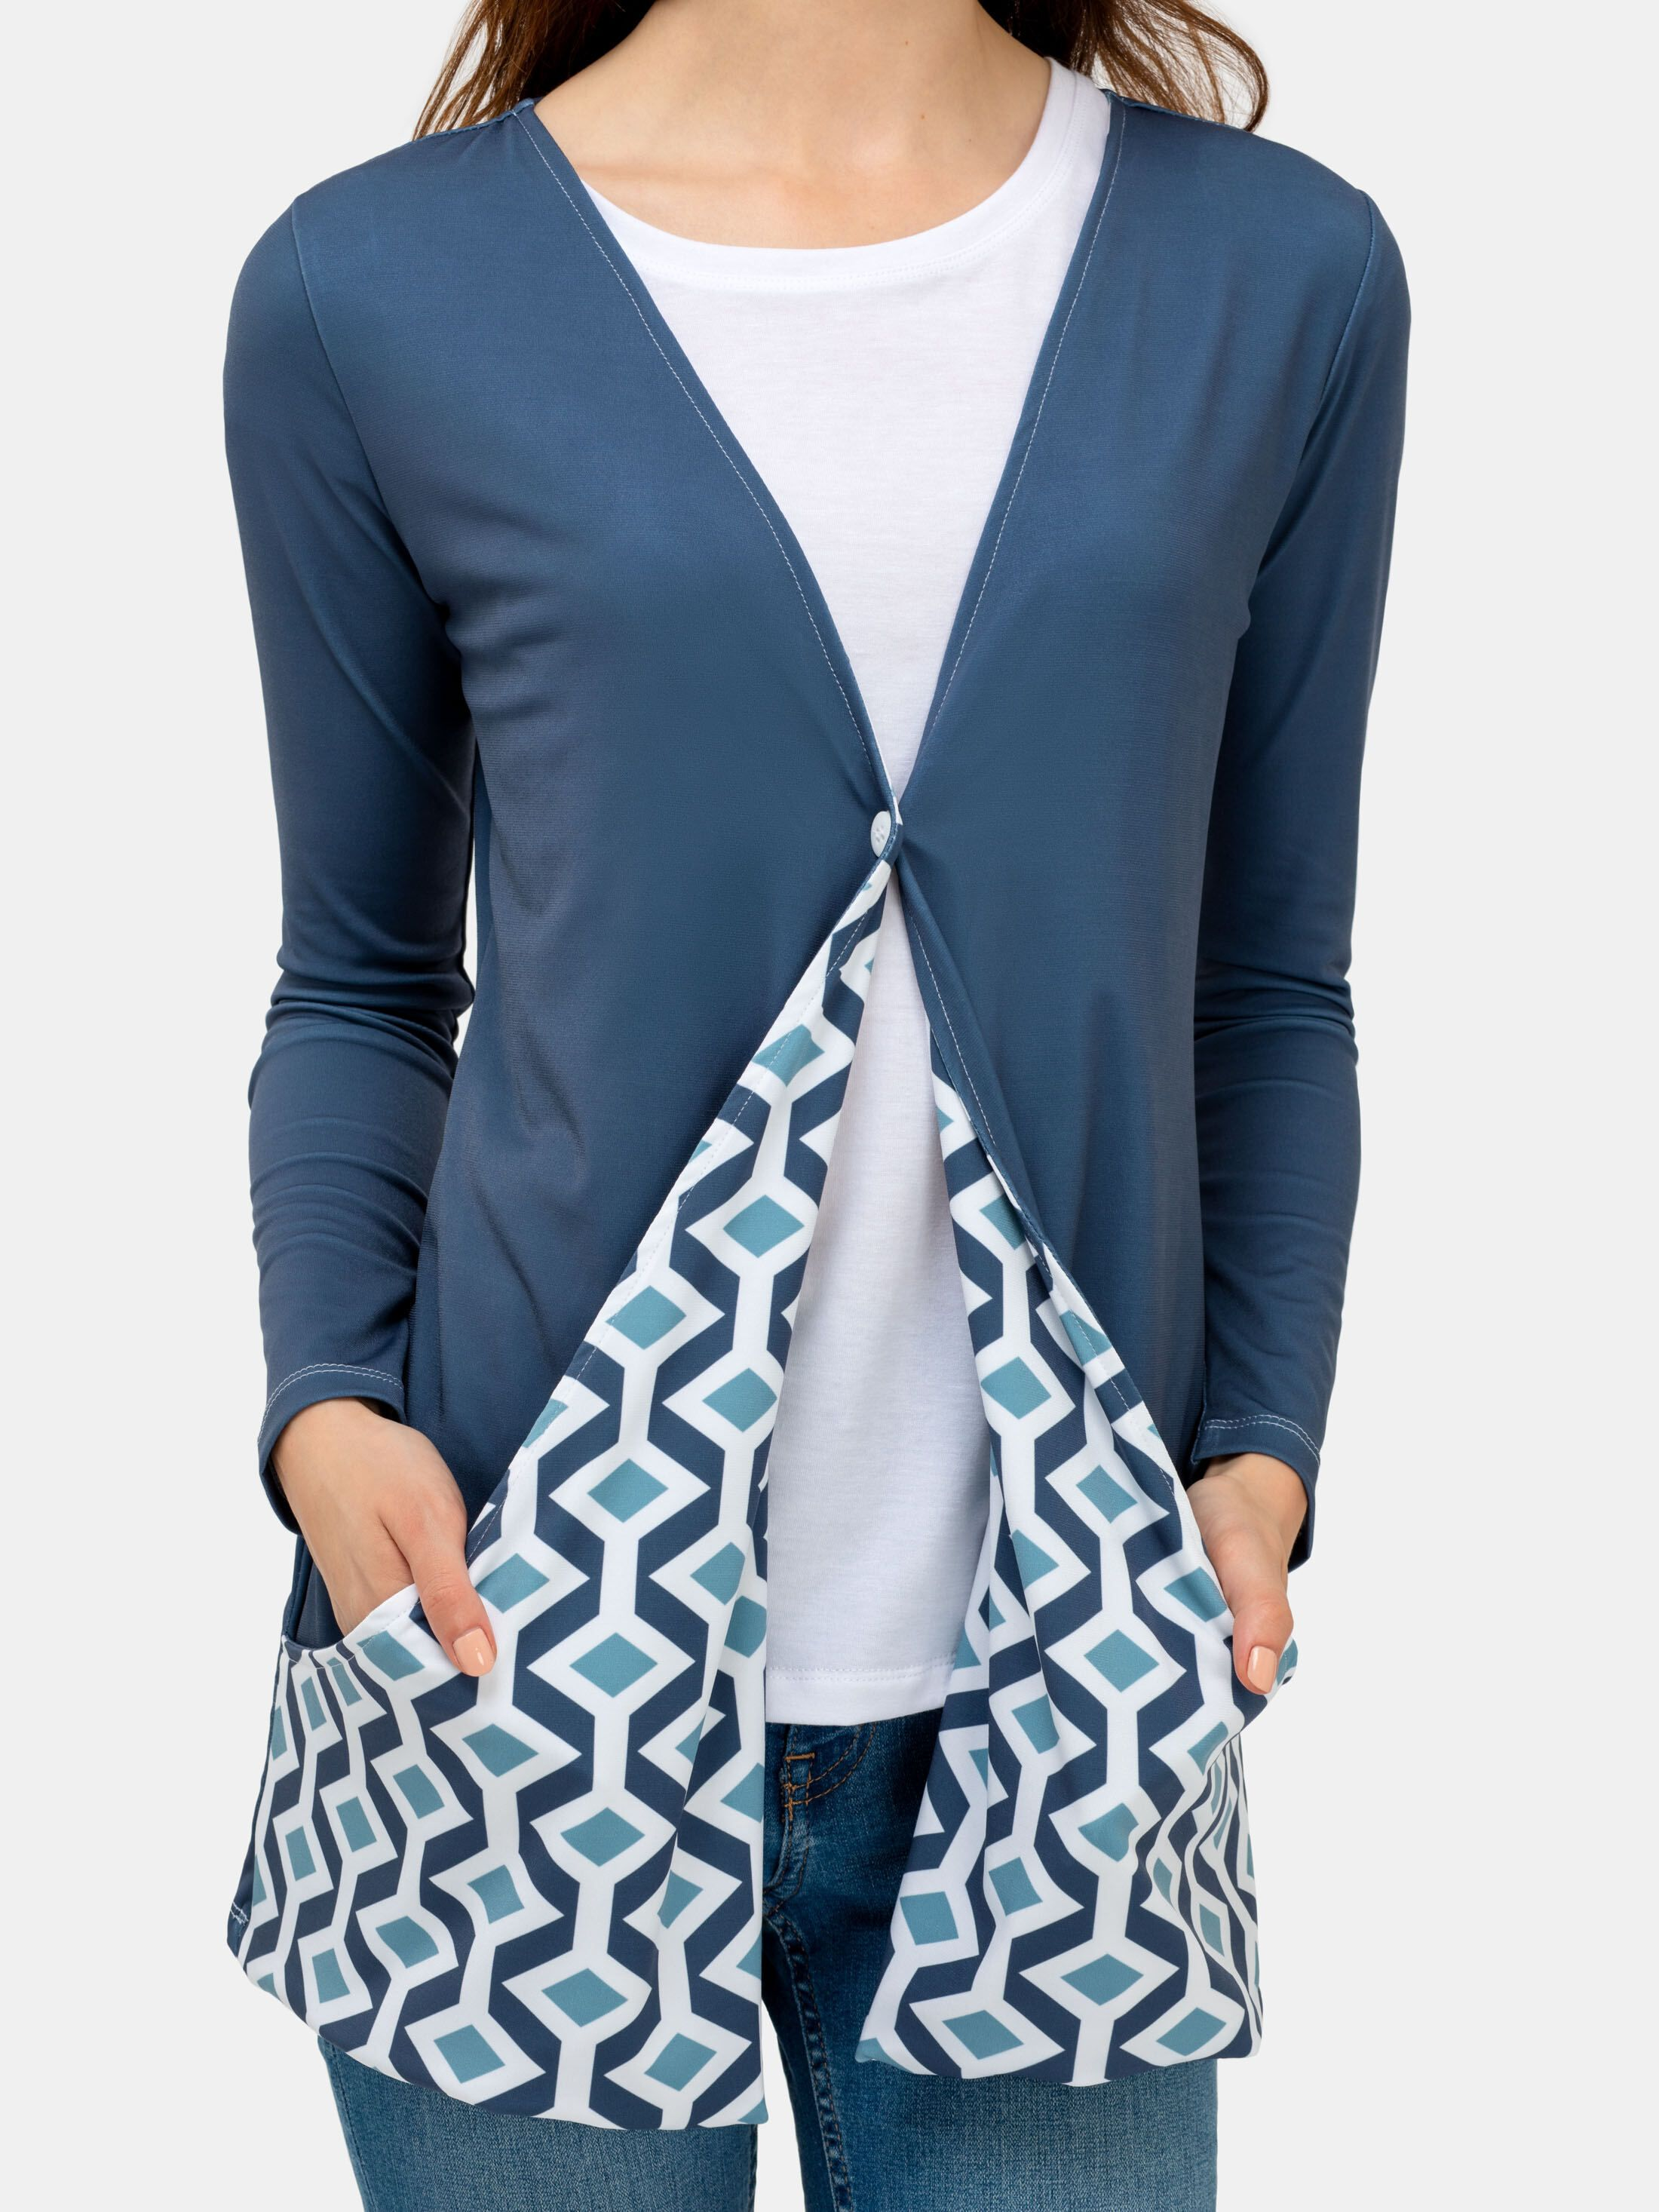 custom ladies cardigan with pockets